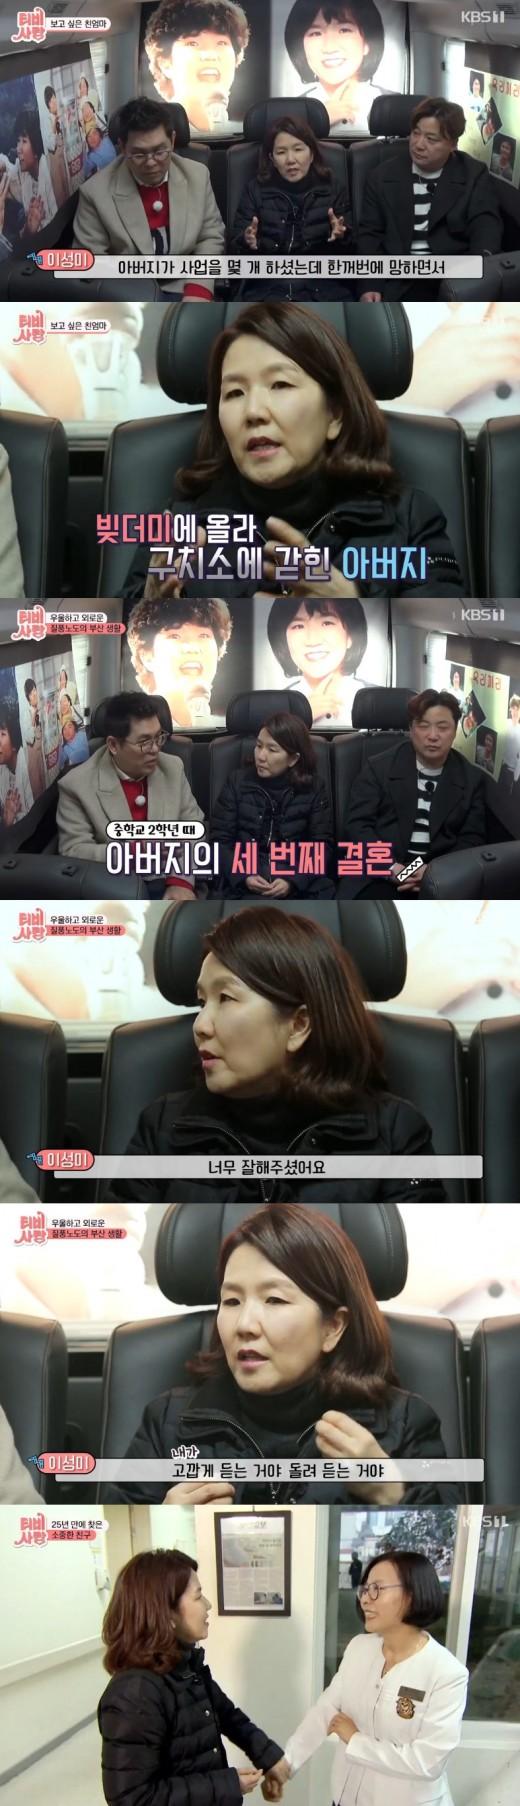 "'TV는 사랑을' 이성미, 父세 번의 결혼·사업실패·母와 생이별 ""아픈 가족사"""